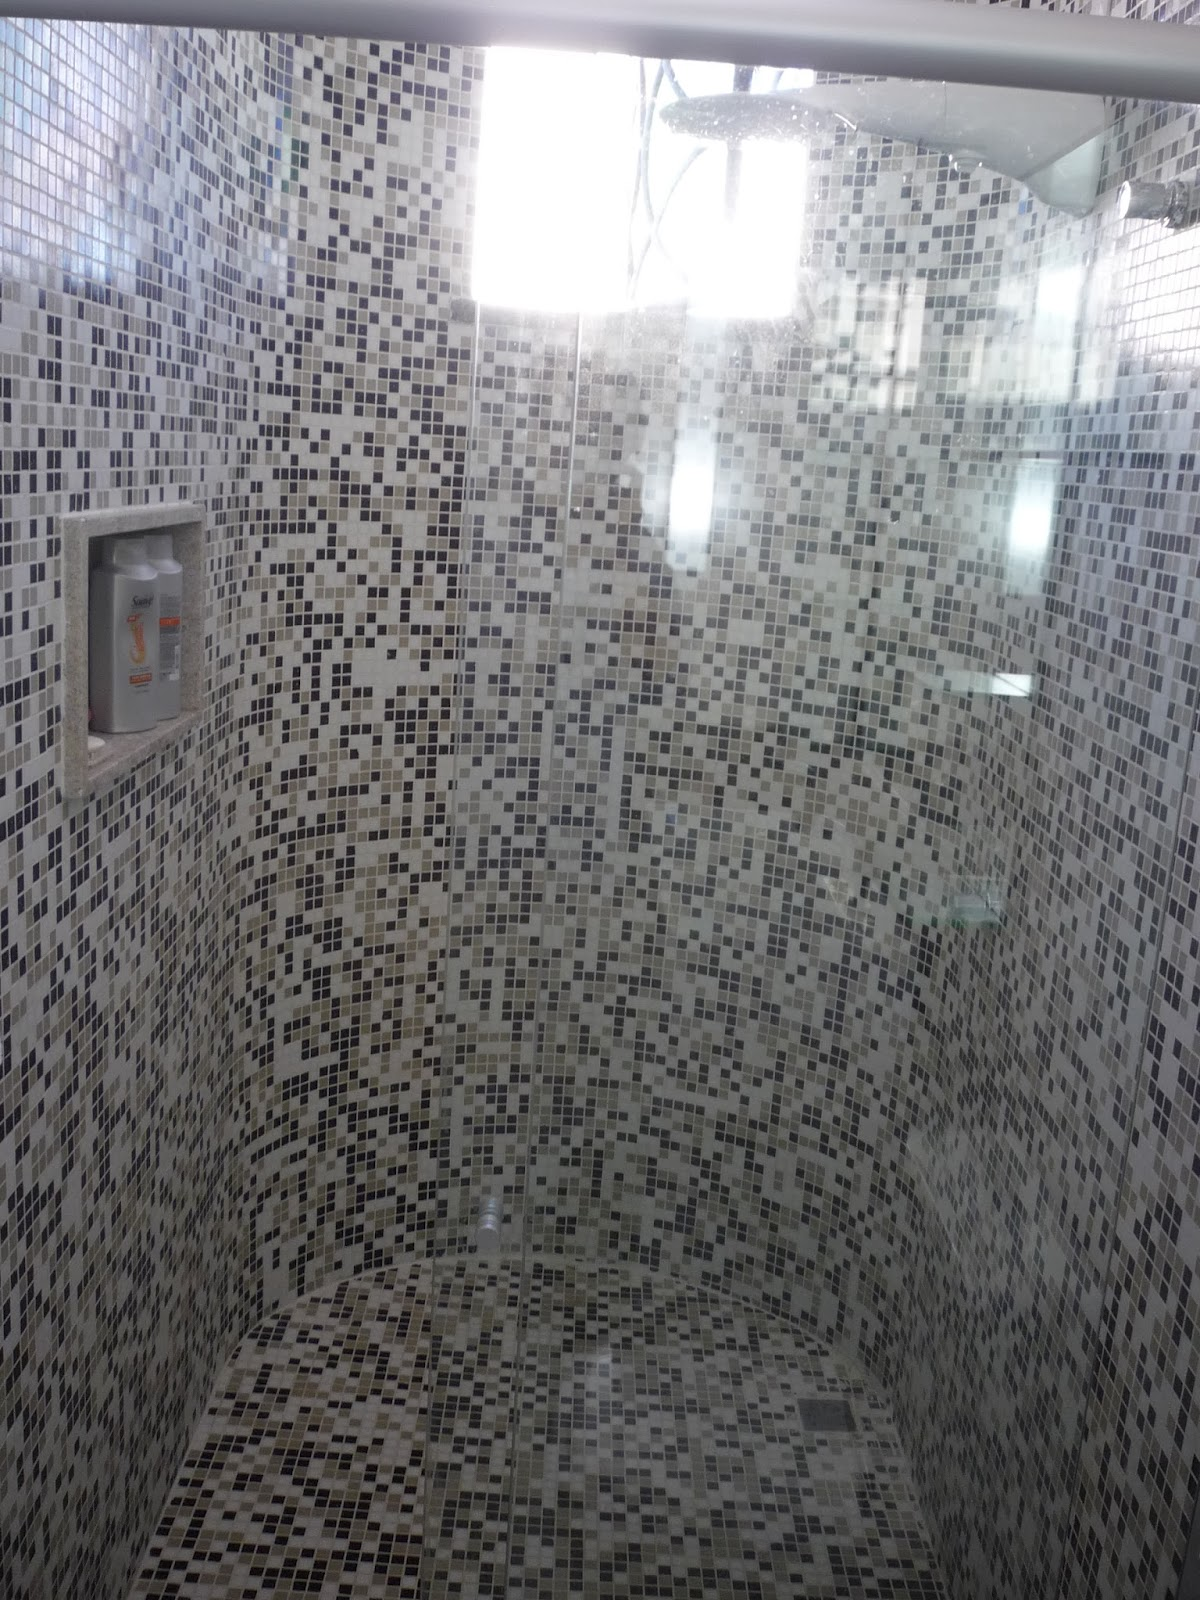 Arquitetura & Interiores: JOGO DE CORES: PRETO   CINZA   BRANCO #5C666F 1200 1600